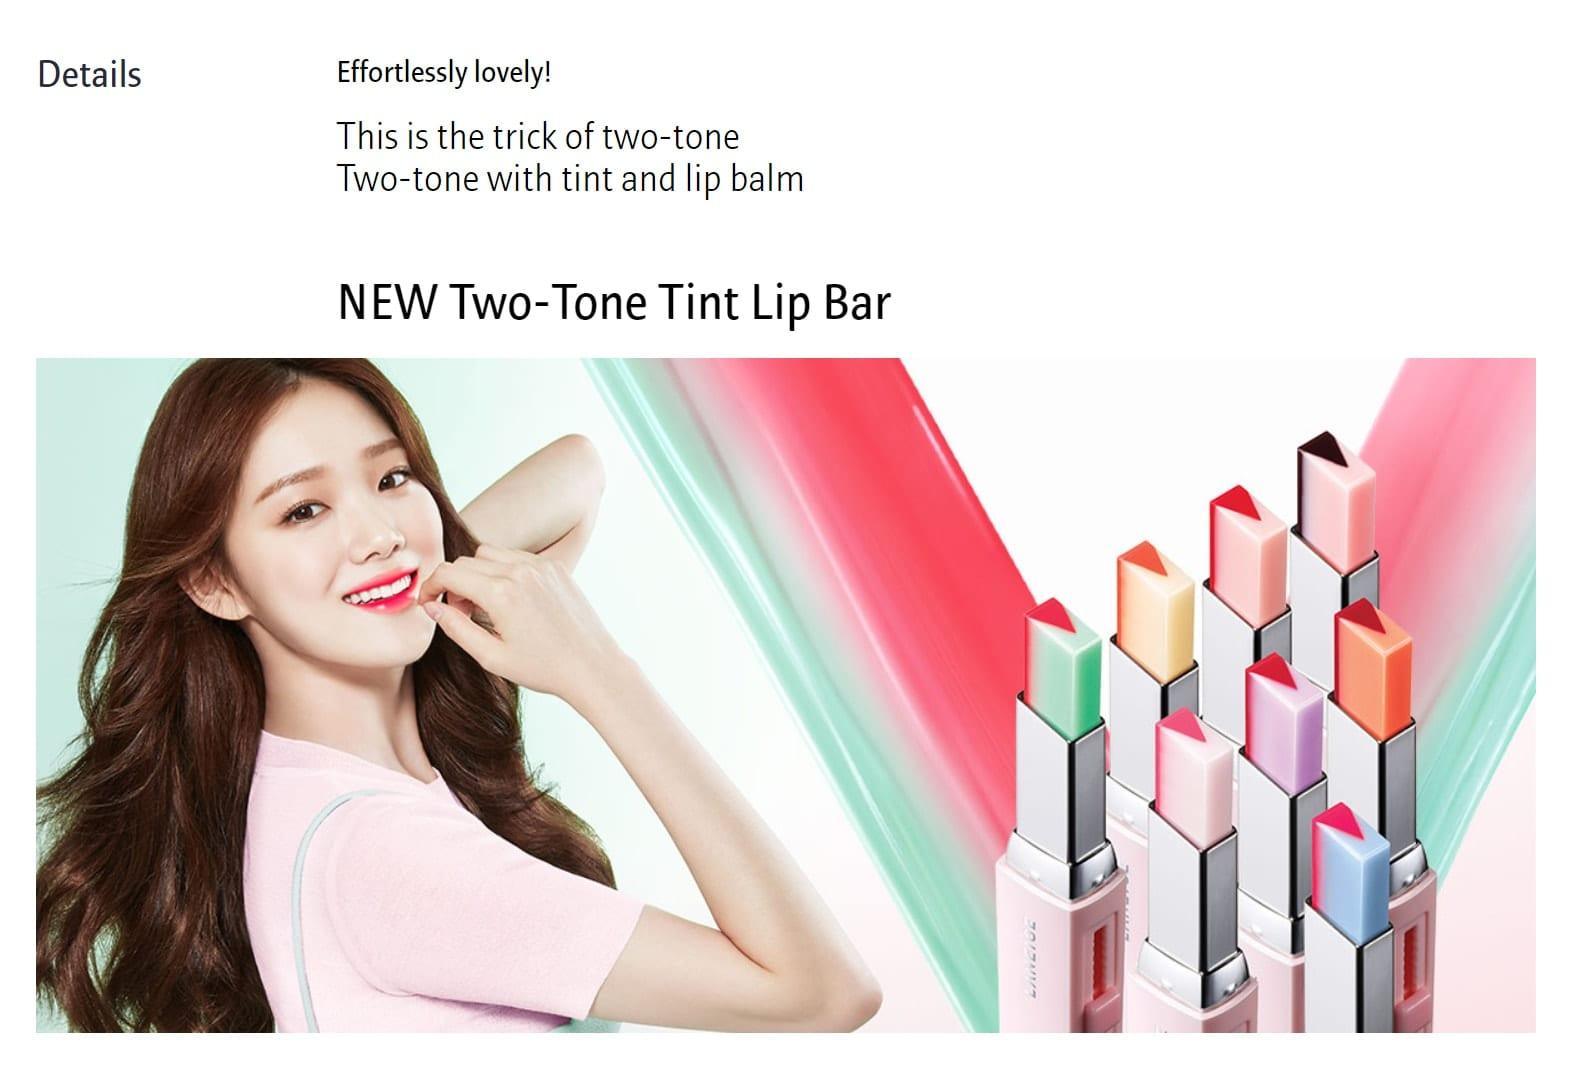 Laneige Two Tone Tint Lip Bar - details